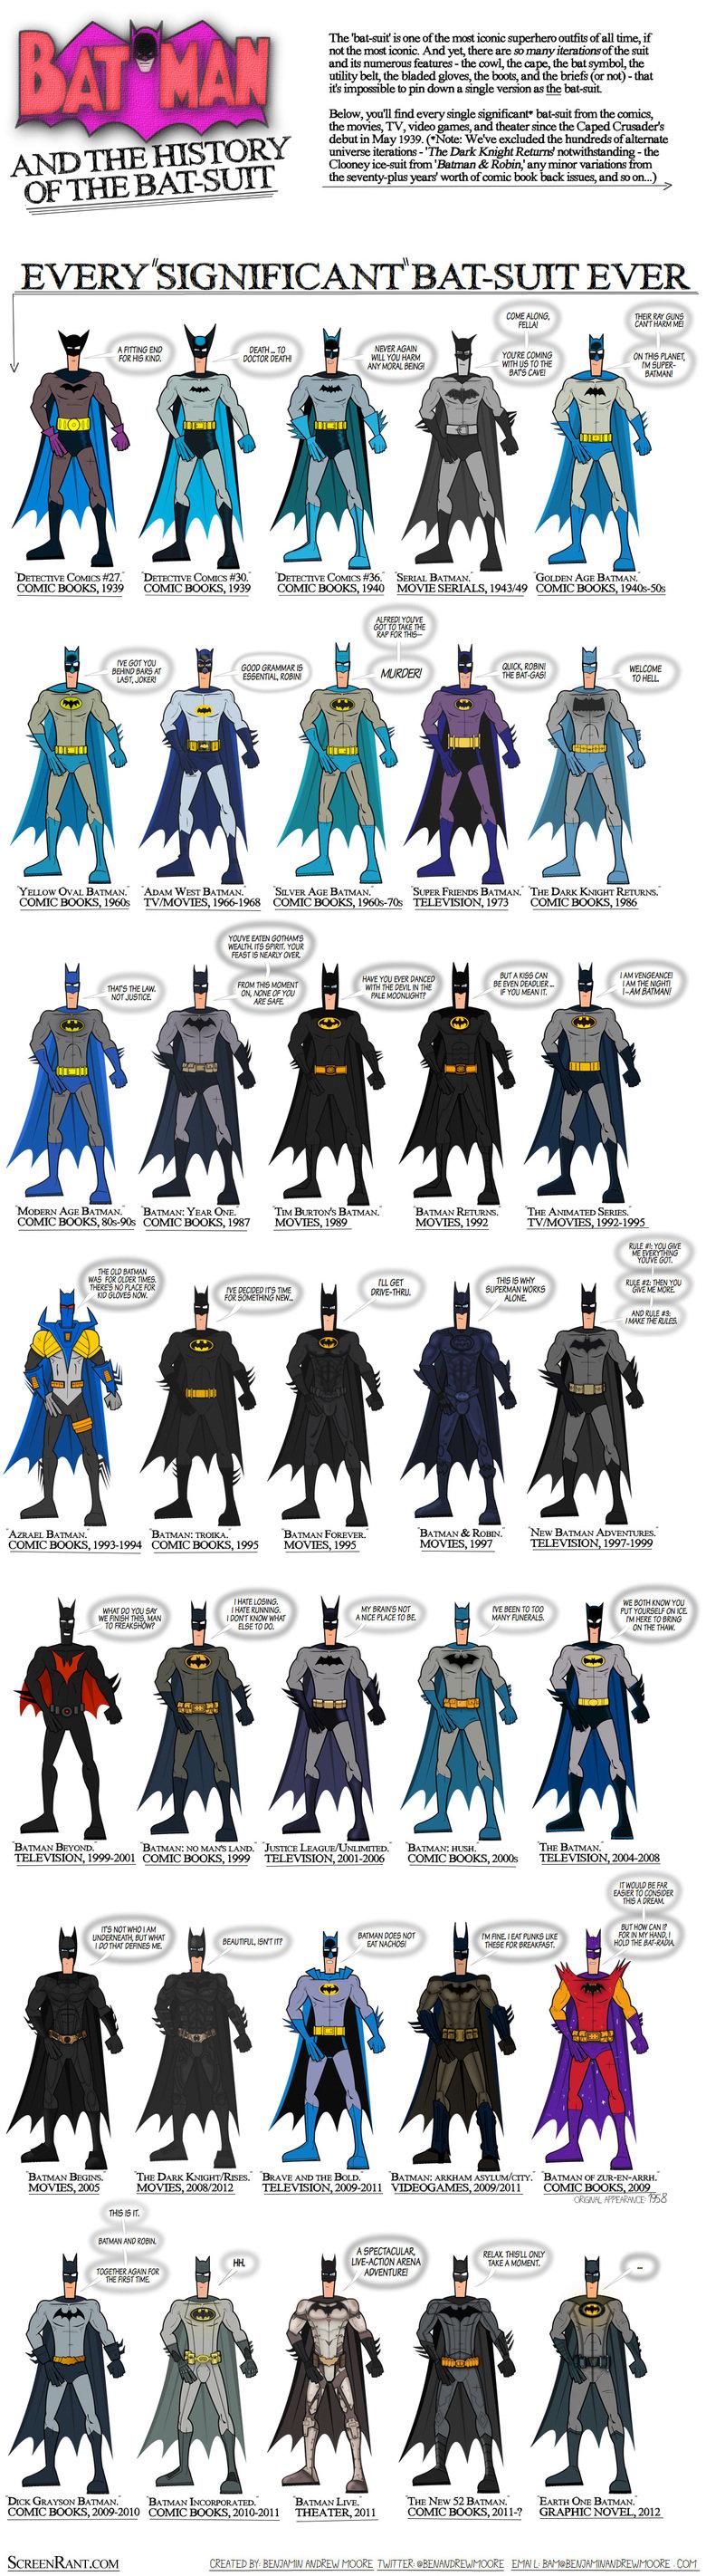 The Many Suits of Batman.. Batman has always been the hero Gotham deserves. [tagsareusedcorrectly].. Why the are they all so skinny? bat man batman dark knight dark night super hero Super Hero bruce wayne bruce wayne